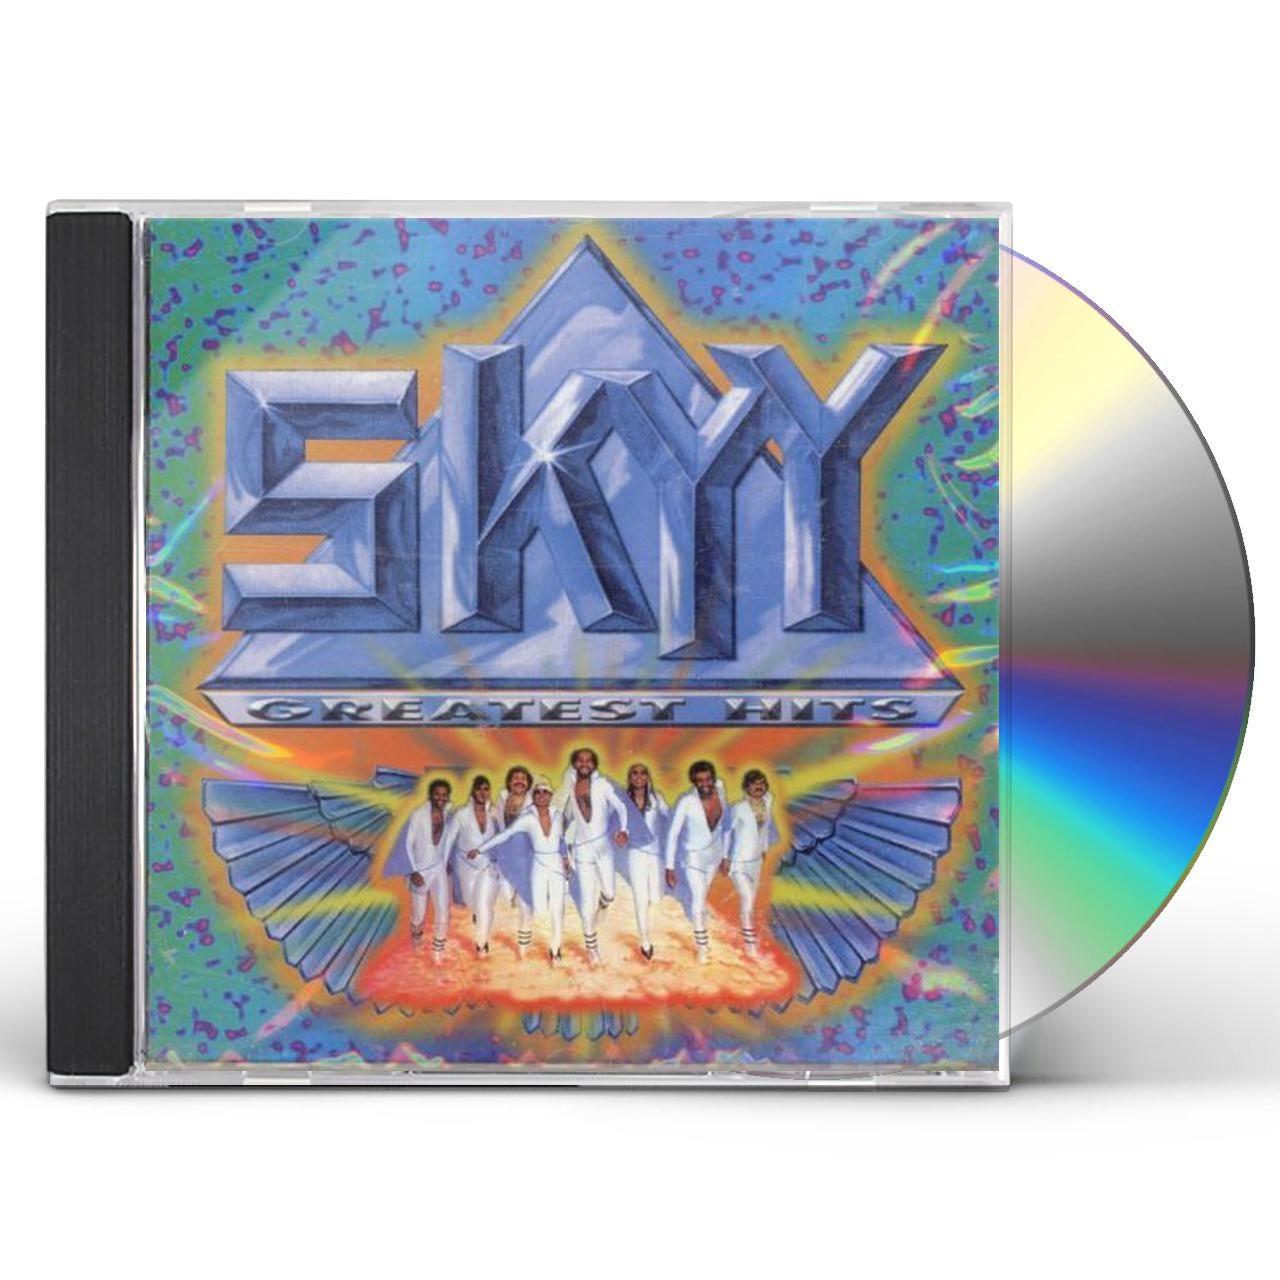 Skyy Greatest Hits Cd